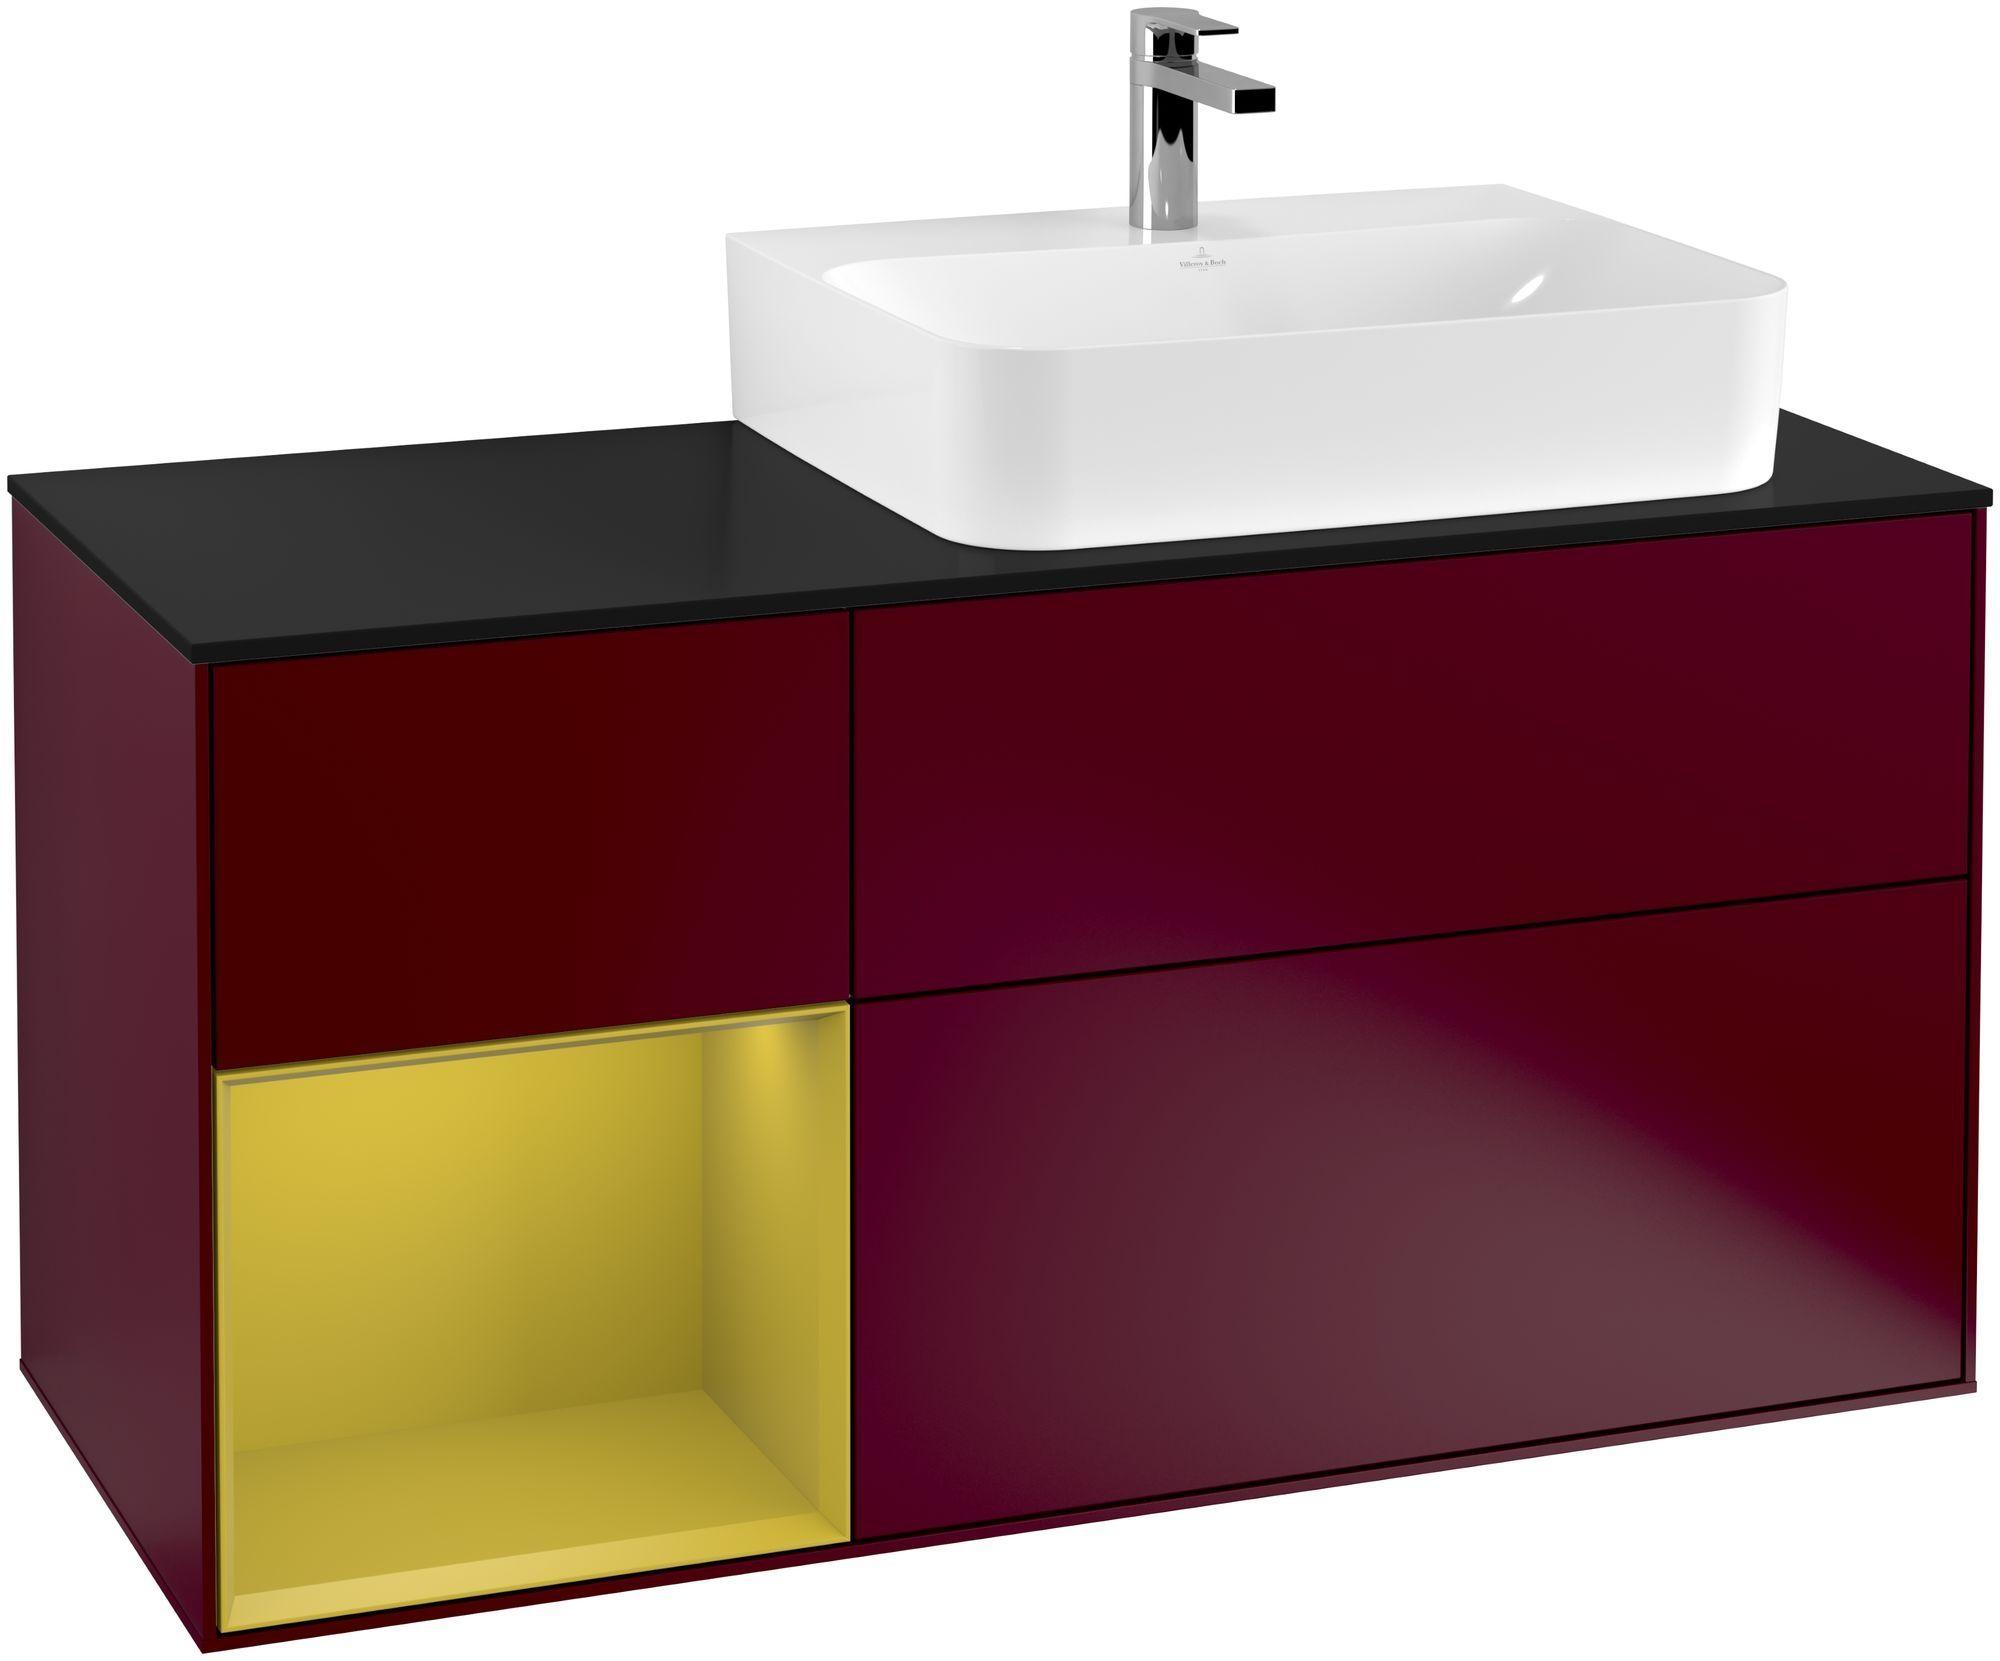 Villeroy & Boch Finion G14 Waschtischunterschrank mit Regalelement 3 Auszüge Waschtisch rechts LED-Beleuchtung B:120xH:60,3xT:50,1cm Front, Korpus: Peony, Regal: Sun, Glasplatte: Black Matt G142HEHB